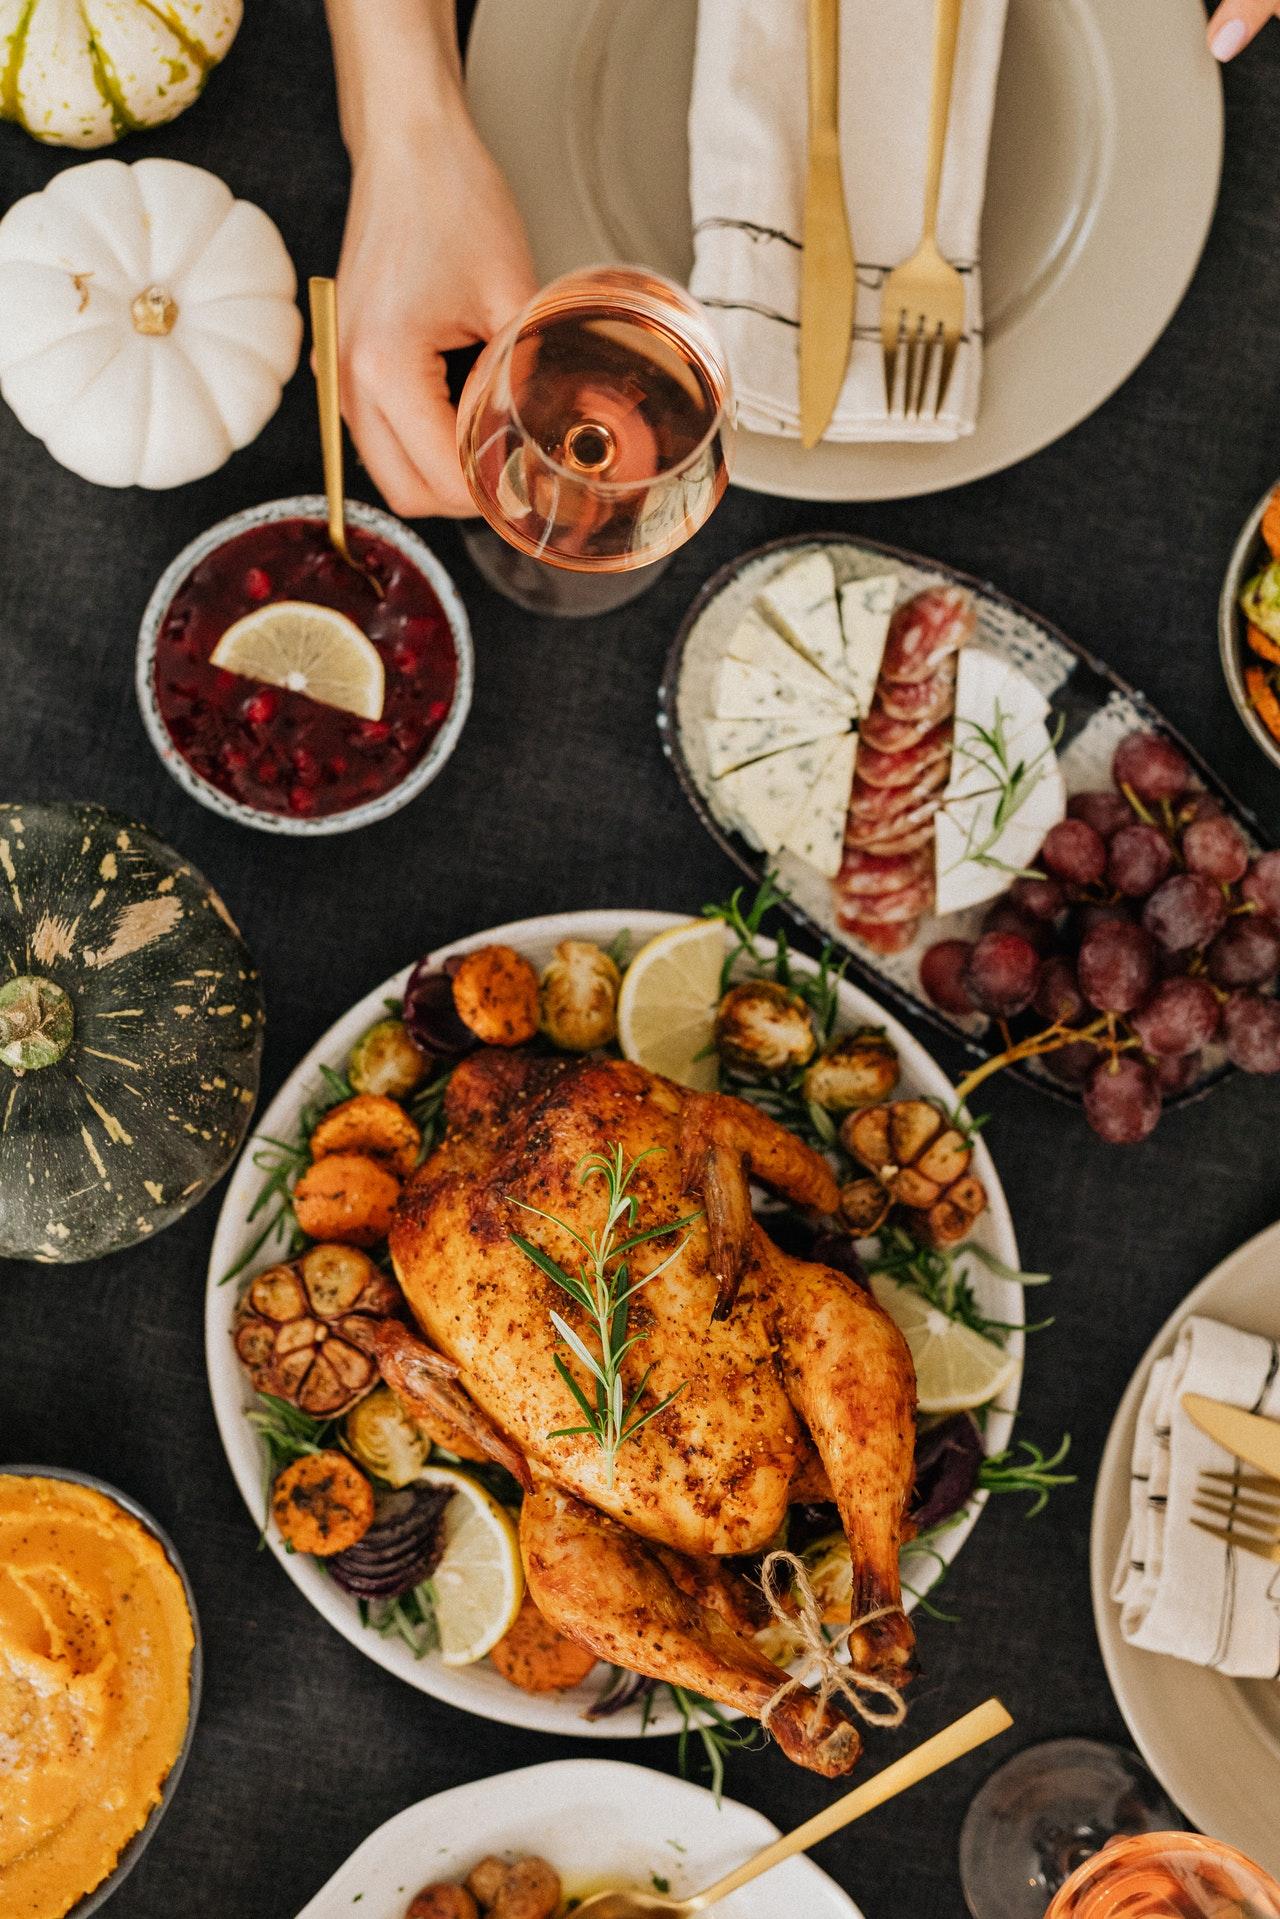 Traditional Thanksgiving family dinner